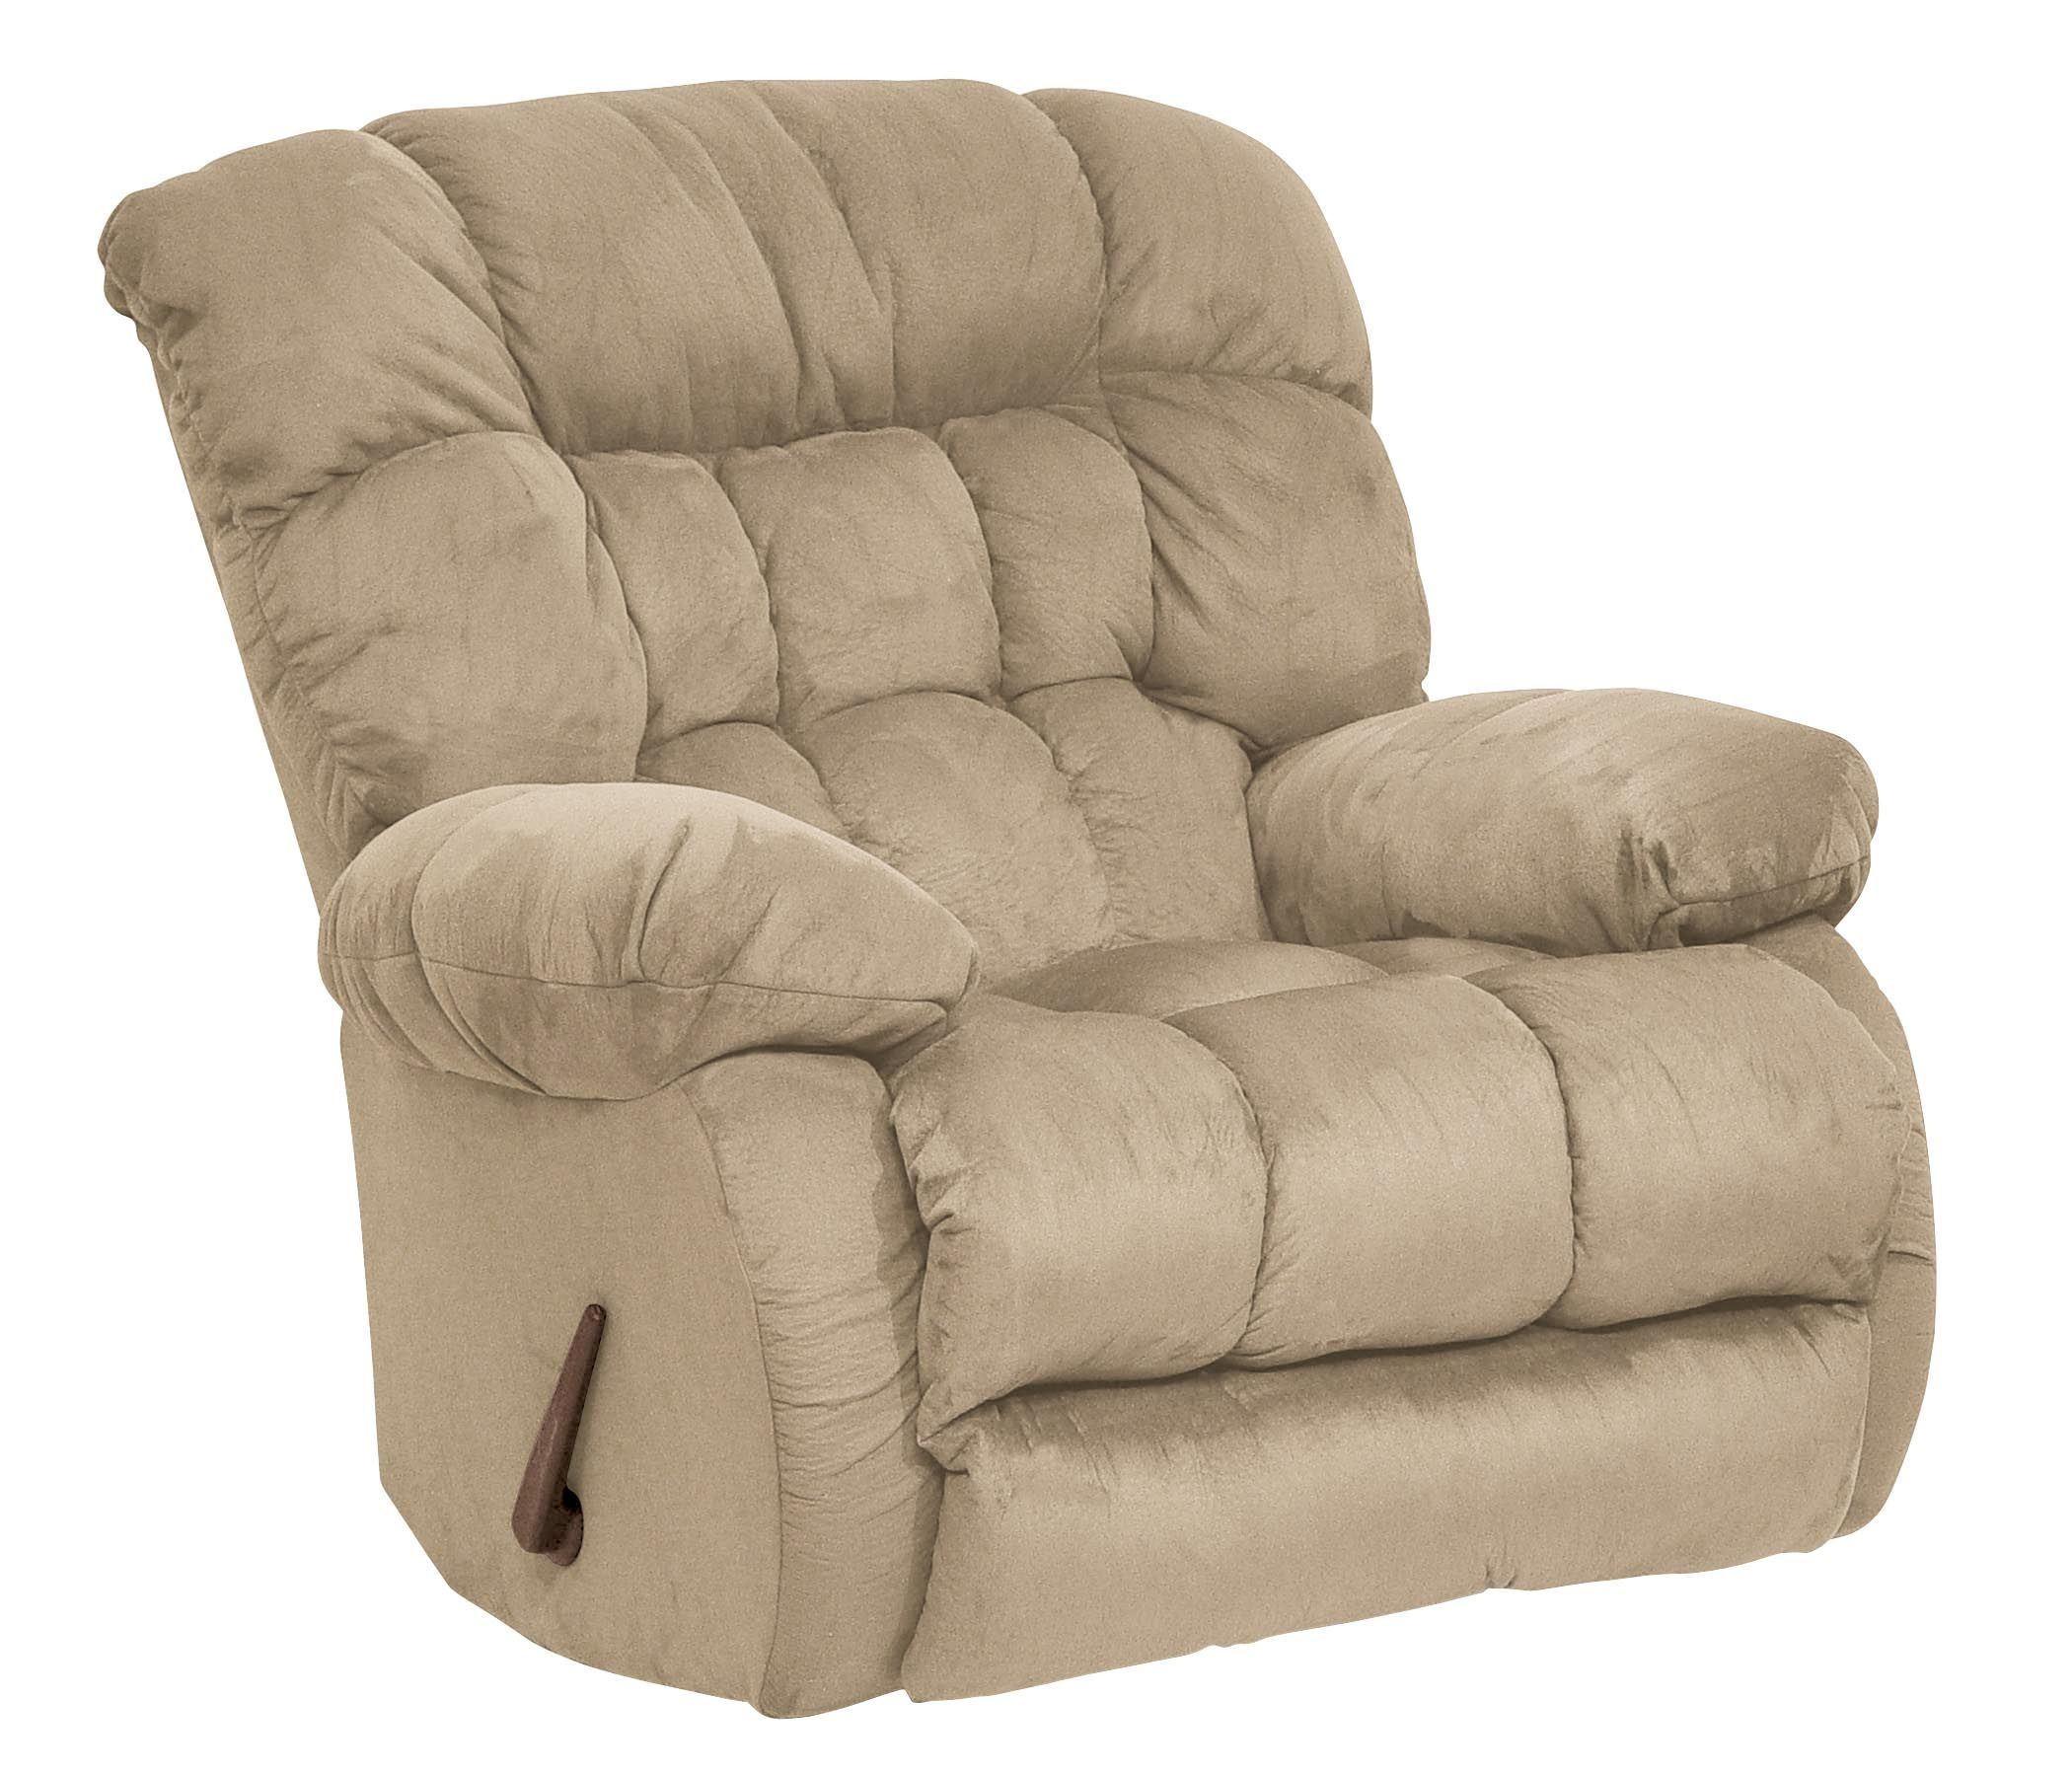 Teddy bear hazelnut inch away recliner from catnapper for Catnapper cloud nine chaise recliner